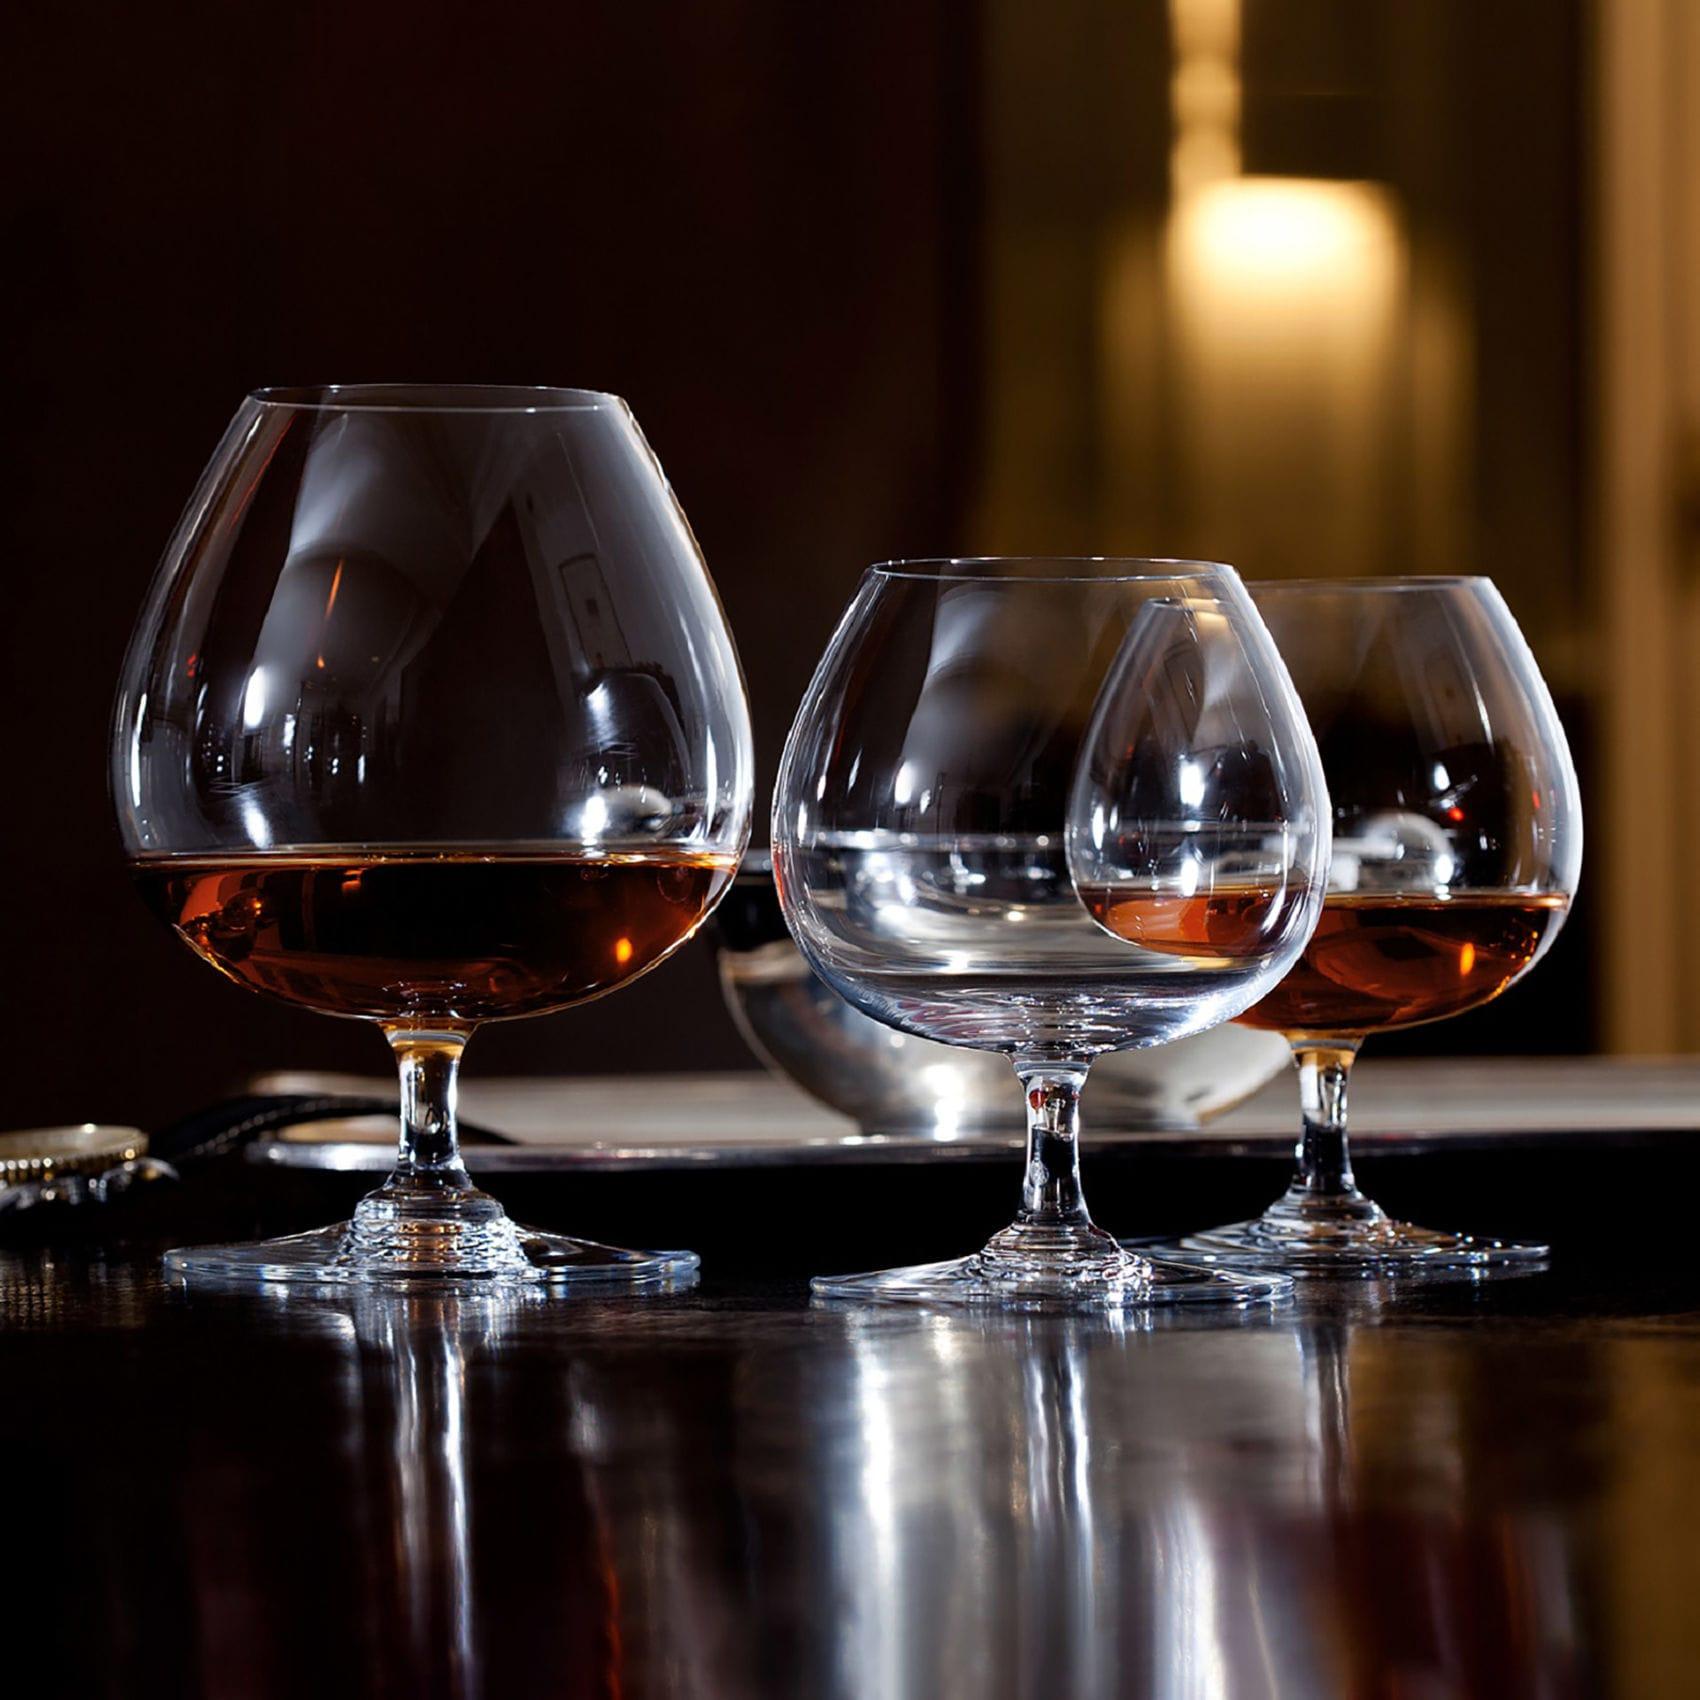 Random Coganc Fact: - The most expensive bottling of cognac in the world, Henri IV Dudognon Heritage Cognac Grande Champagne, sells for $2 Million a bottle.